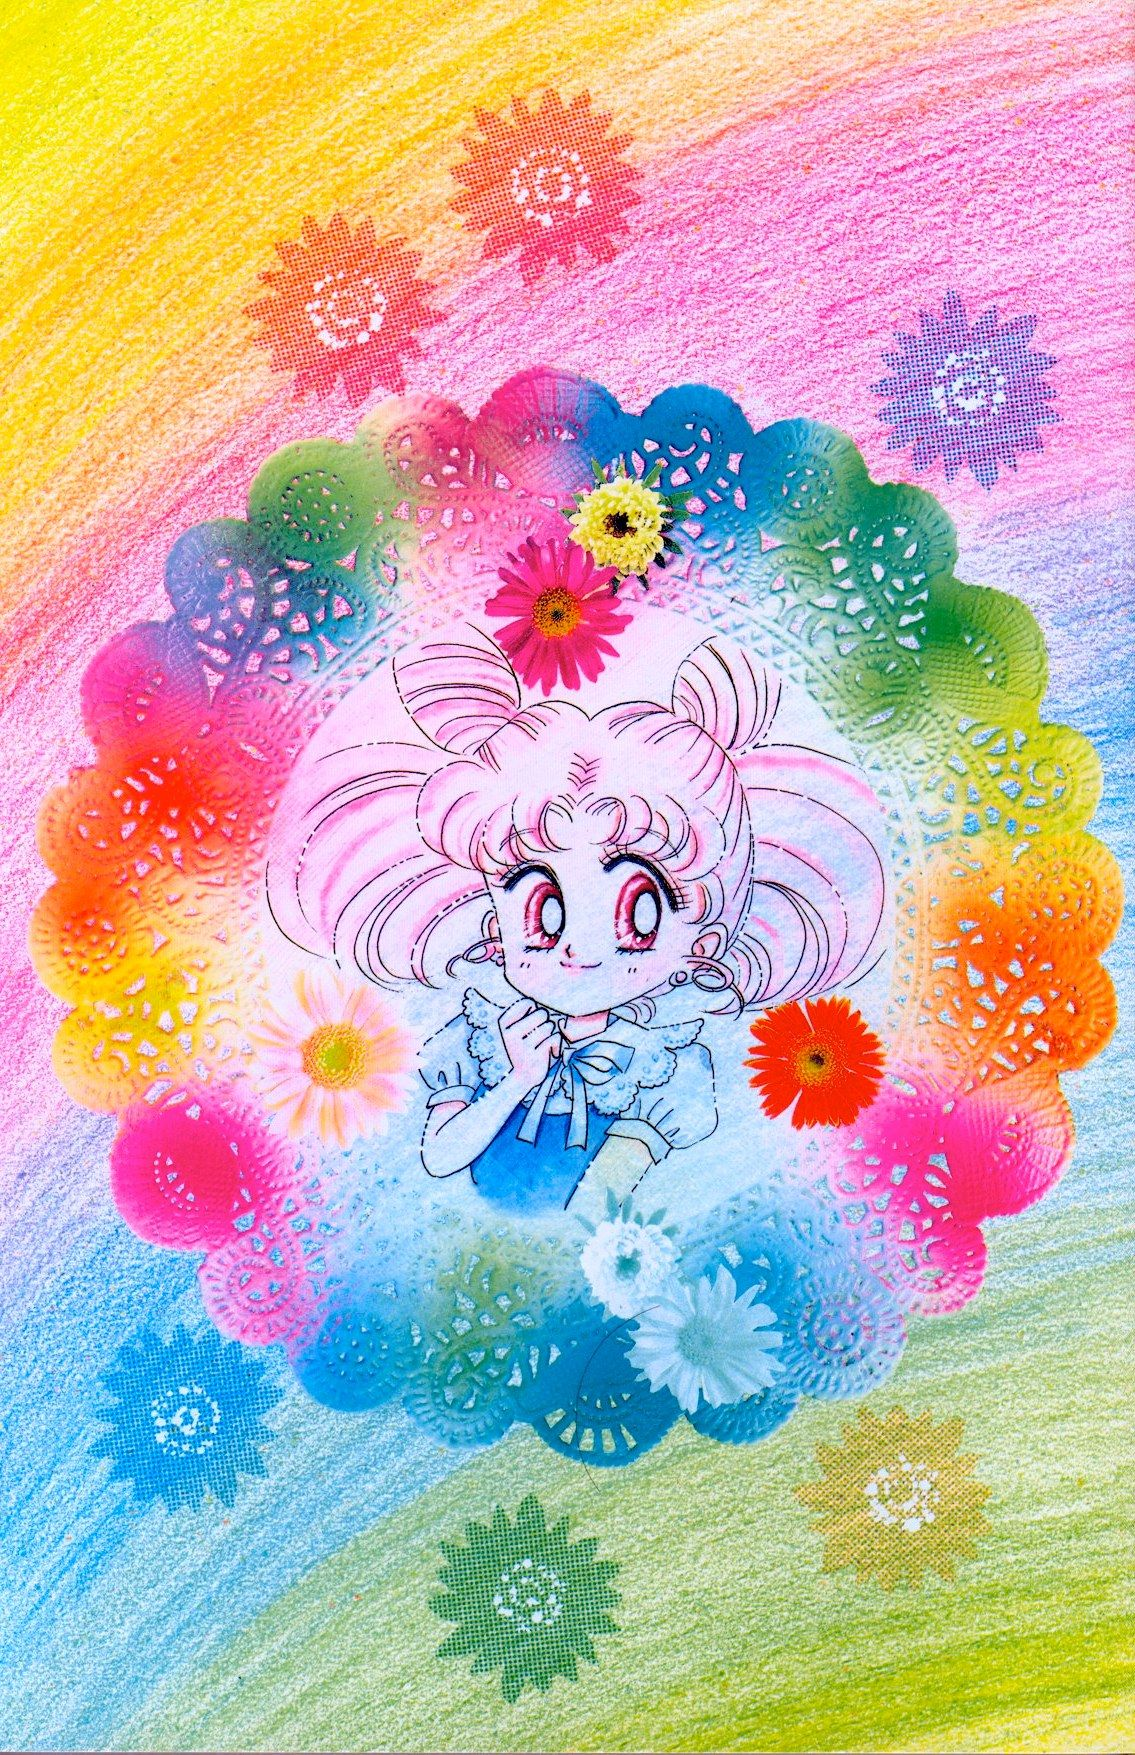 ChibiUsa; from Bishoujo Senshi Sailor Moon Original Picture Collection, Vol. II | art by Naoko Takeuchi